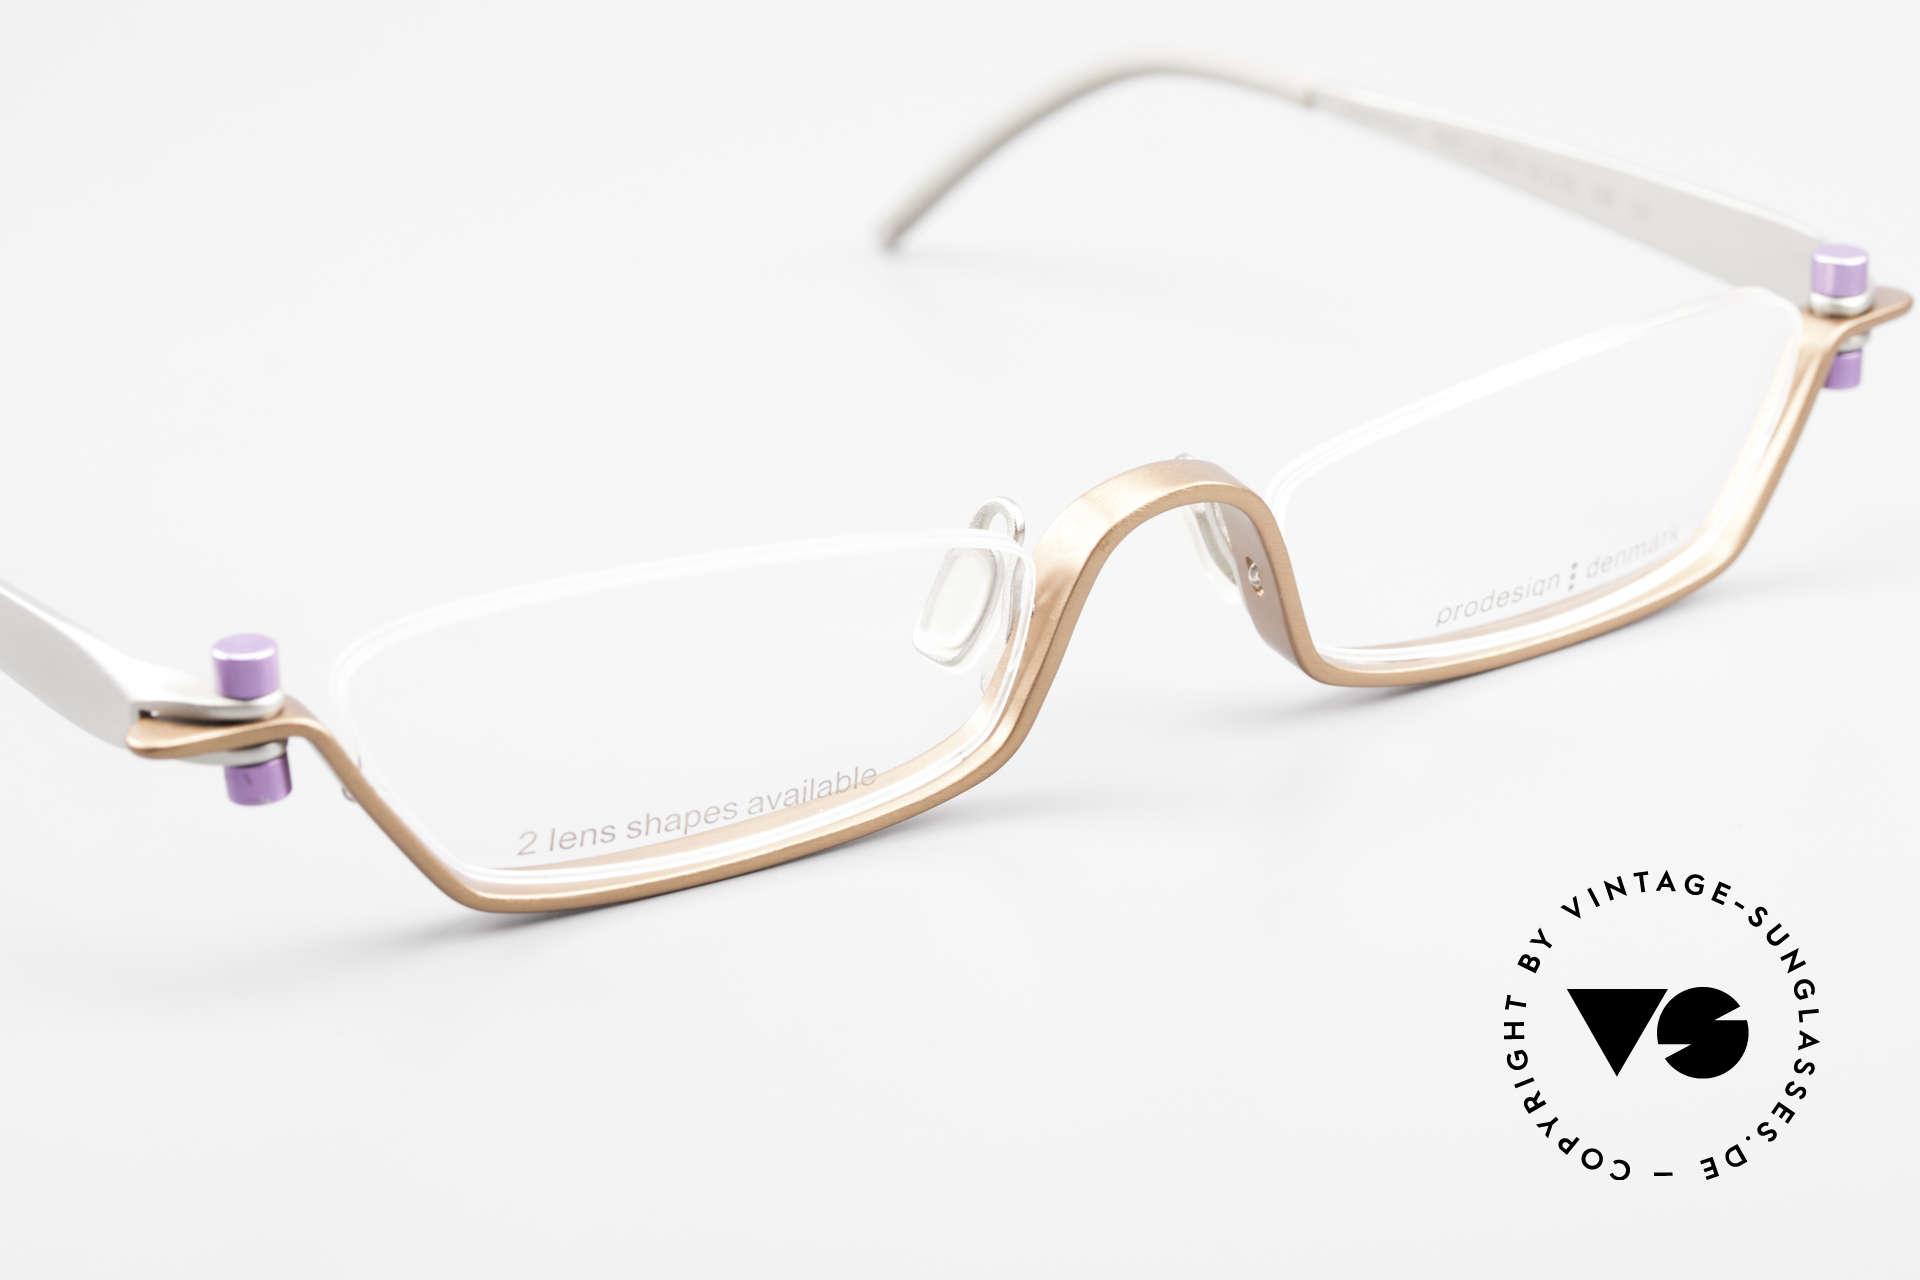 ProDesign 9901 Gail Spence Design Eyeglasses, unworn single item (like all our famous movie specs), Made for Men and Women